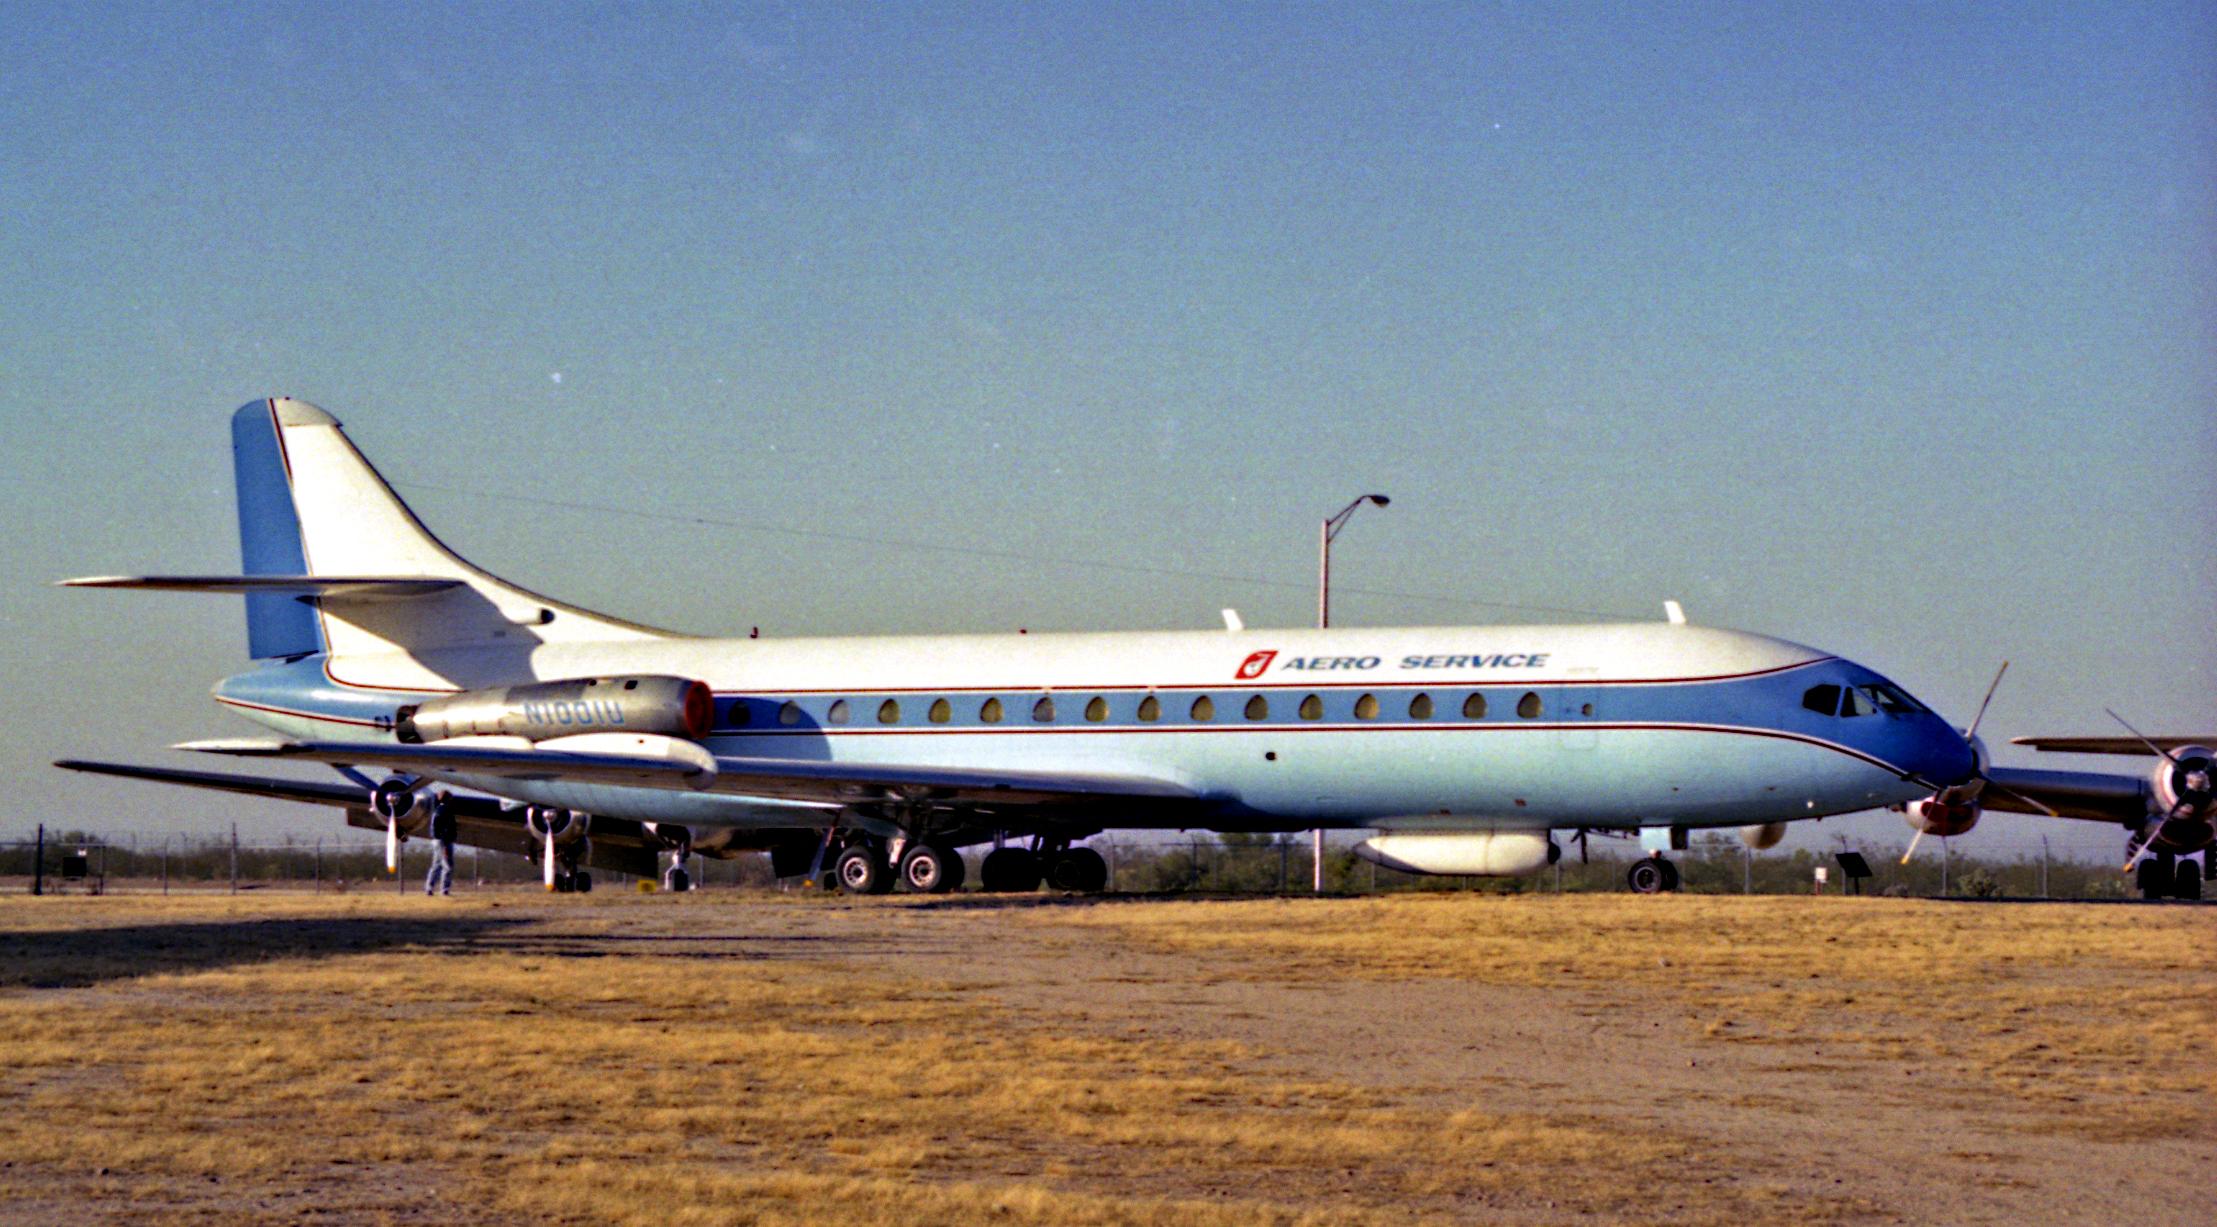 Tucson >> File:Caravelle, Pima Museum, Arizona, 1990.jpg - Wikimedia Commons